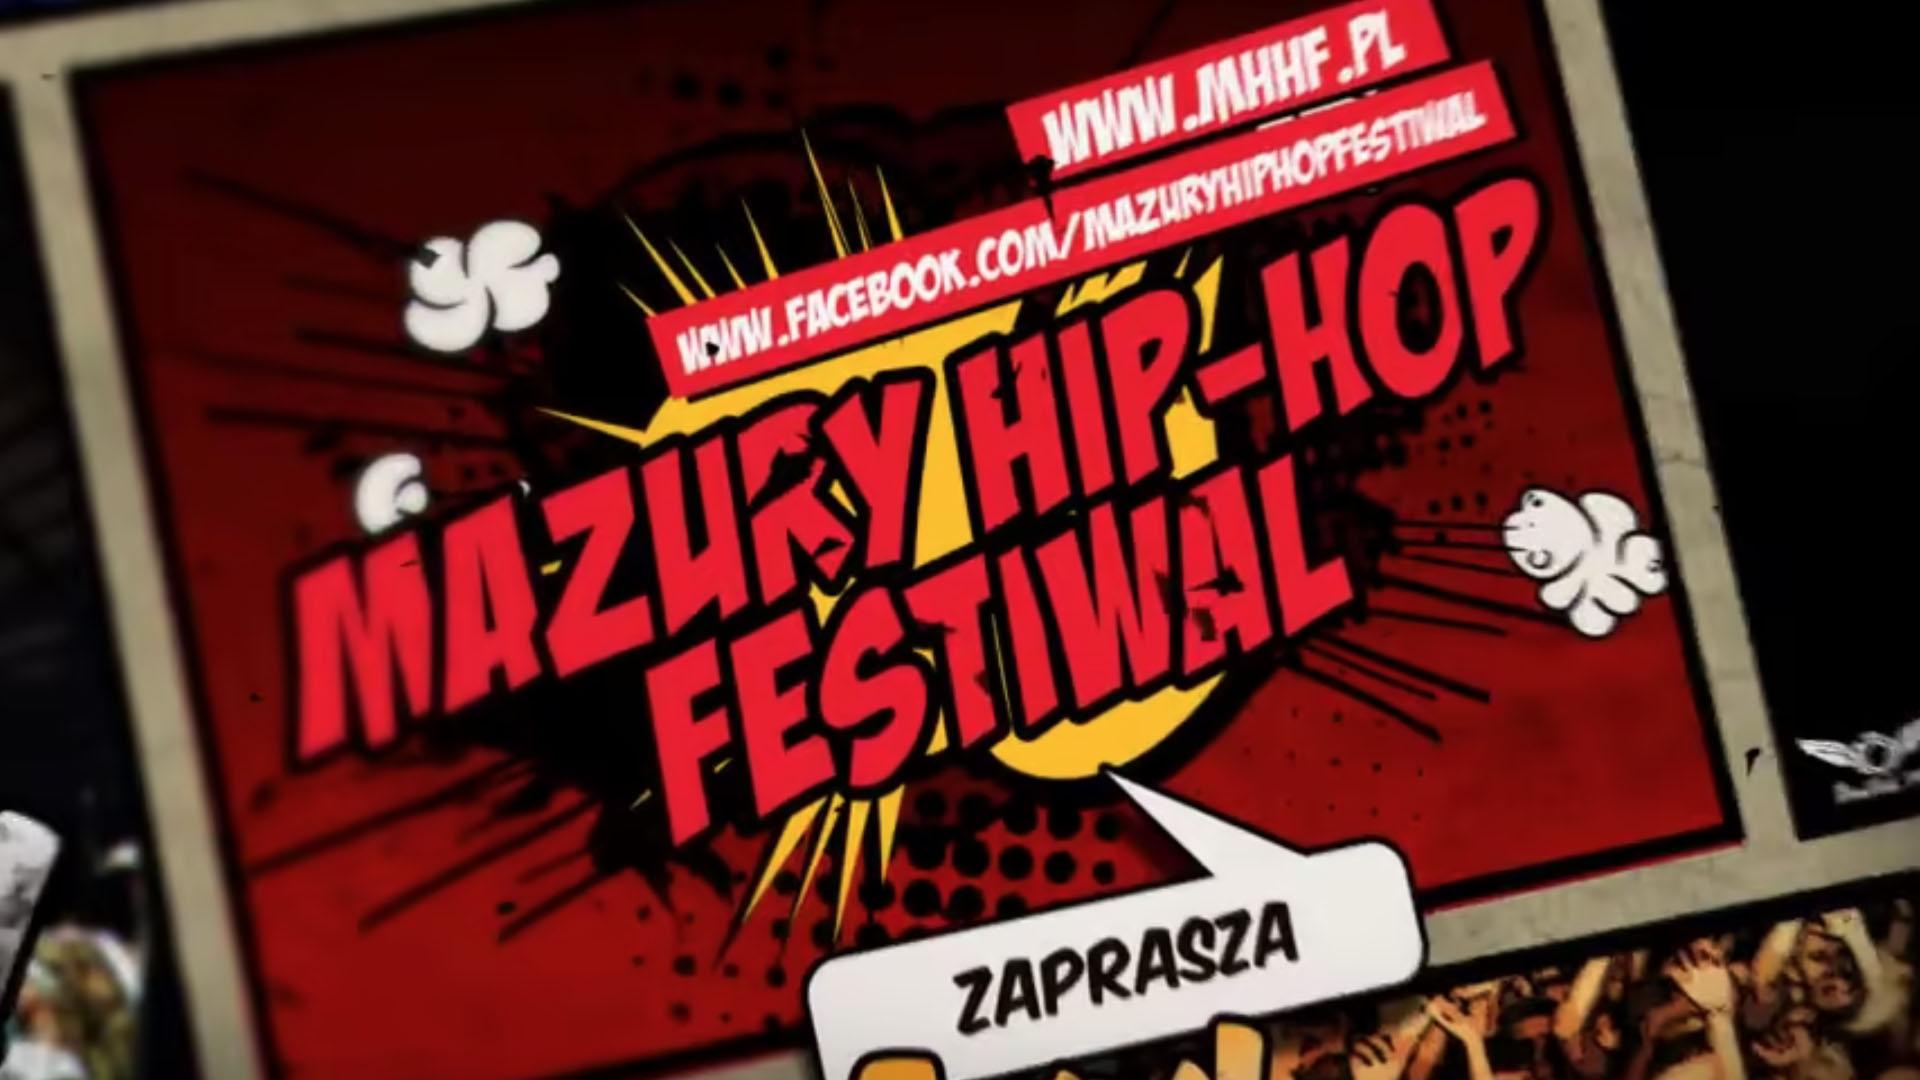 Mazury Hip Hop '14